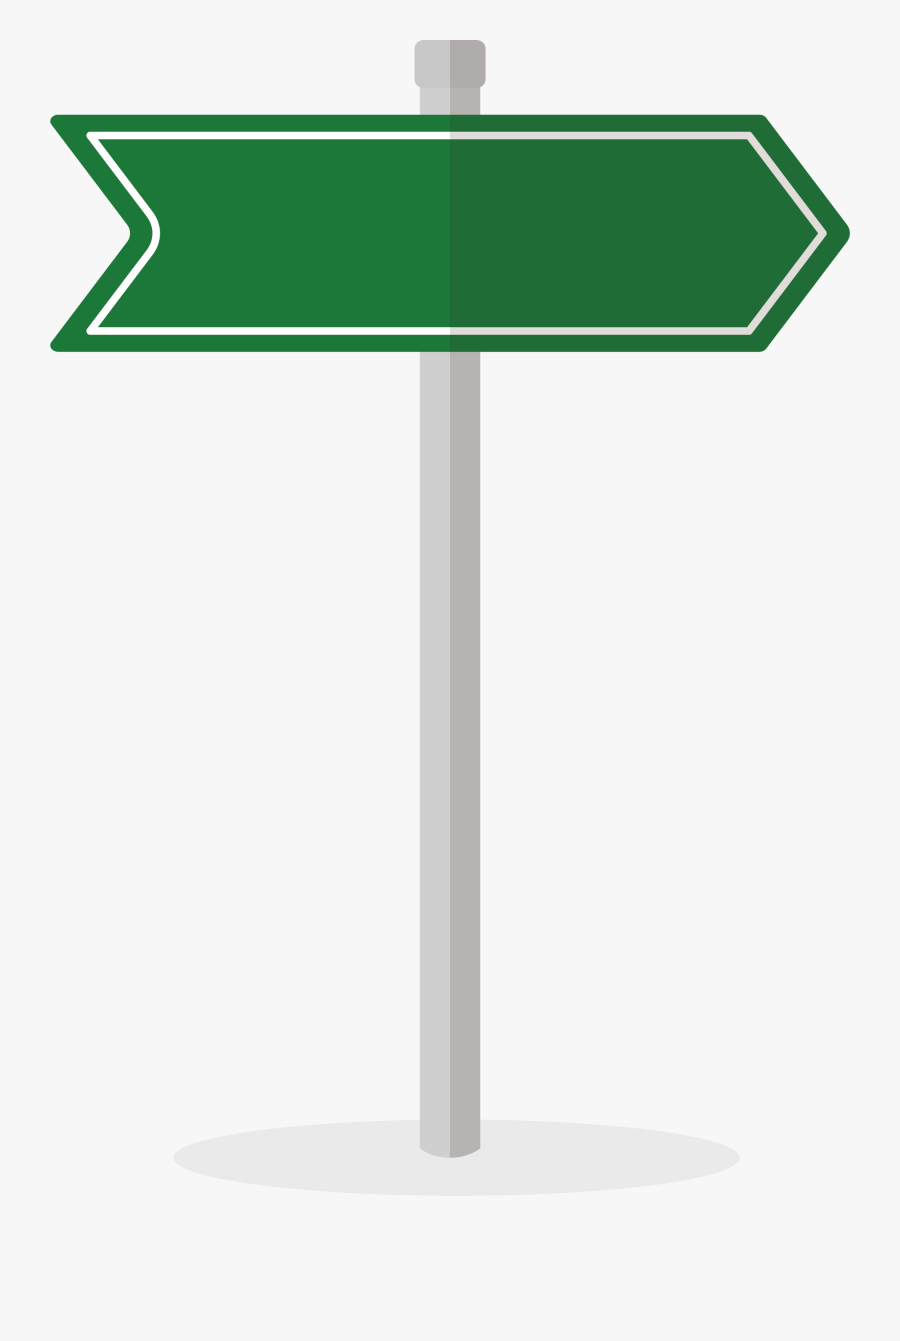 Traffic Sign Arrow Euclidean Vector - Transparent Background Road Sign Png, Transparent Clipart